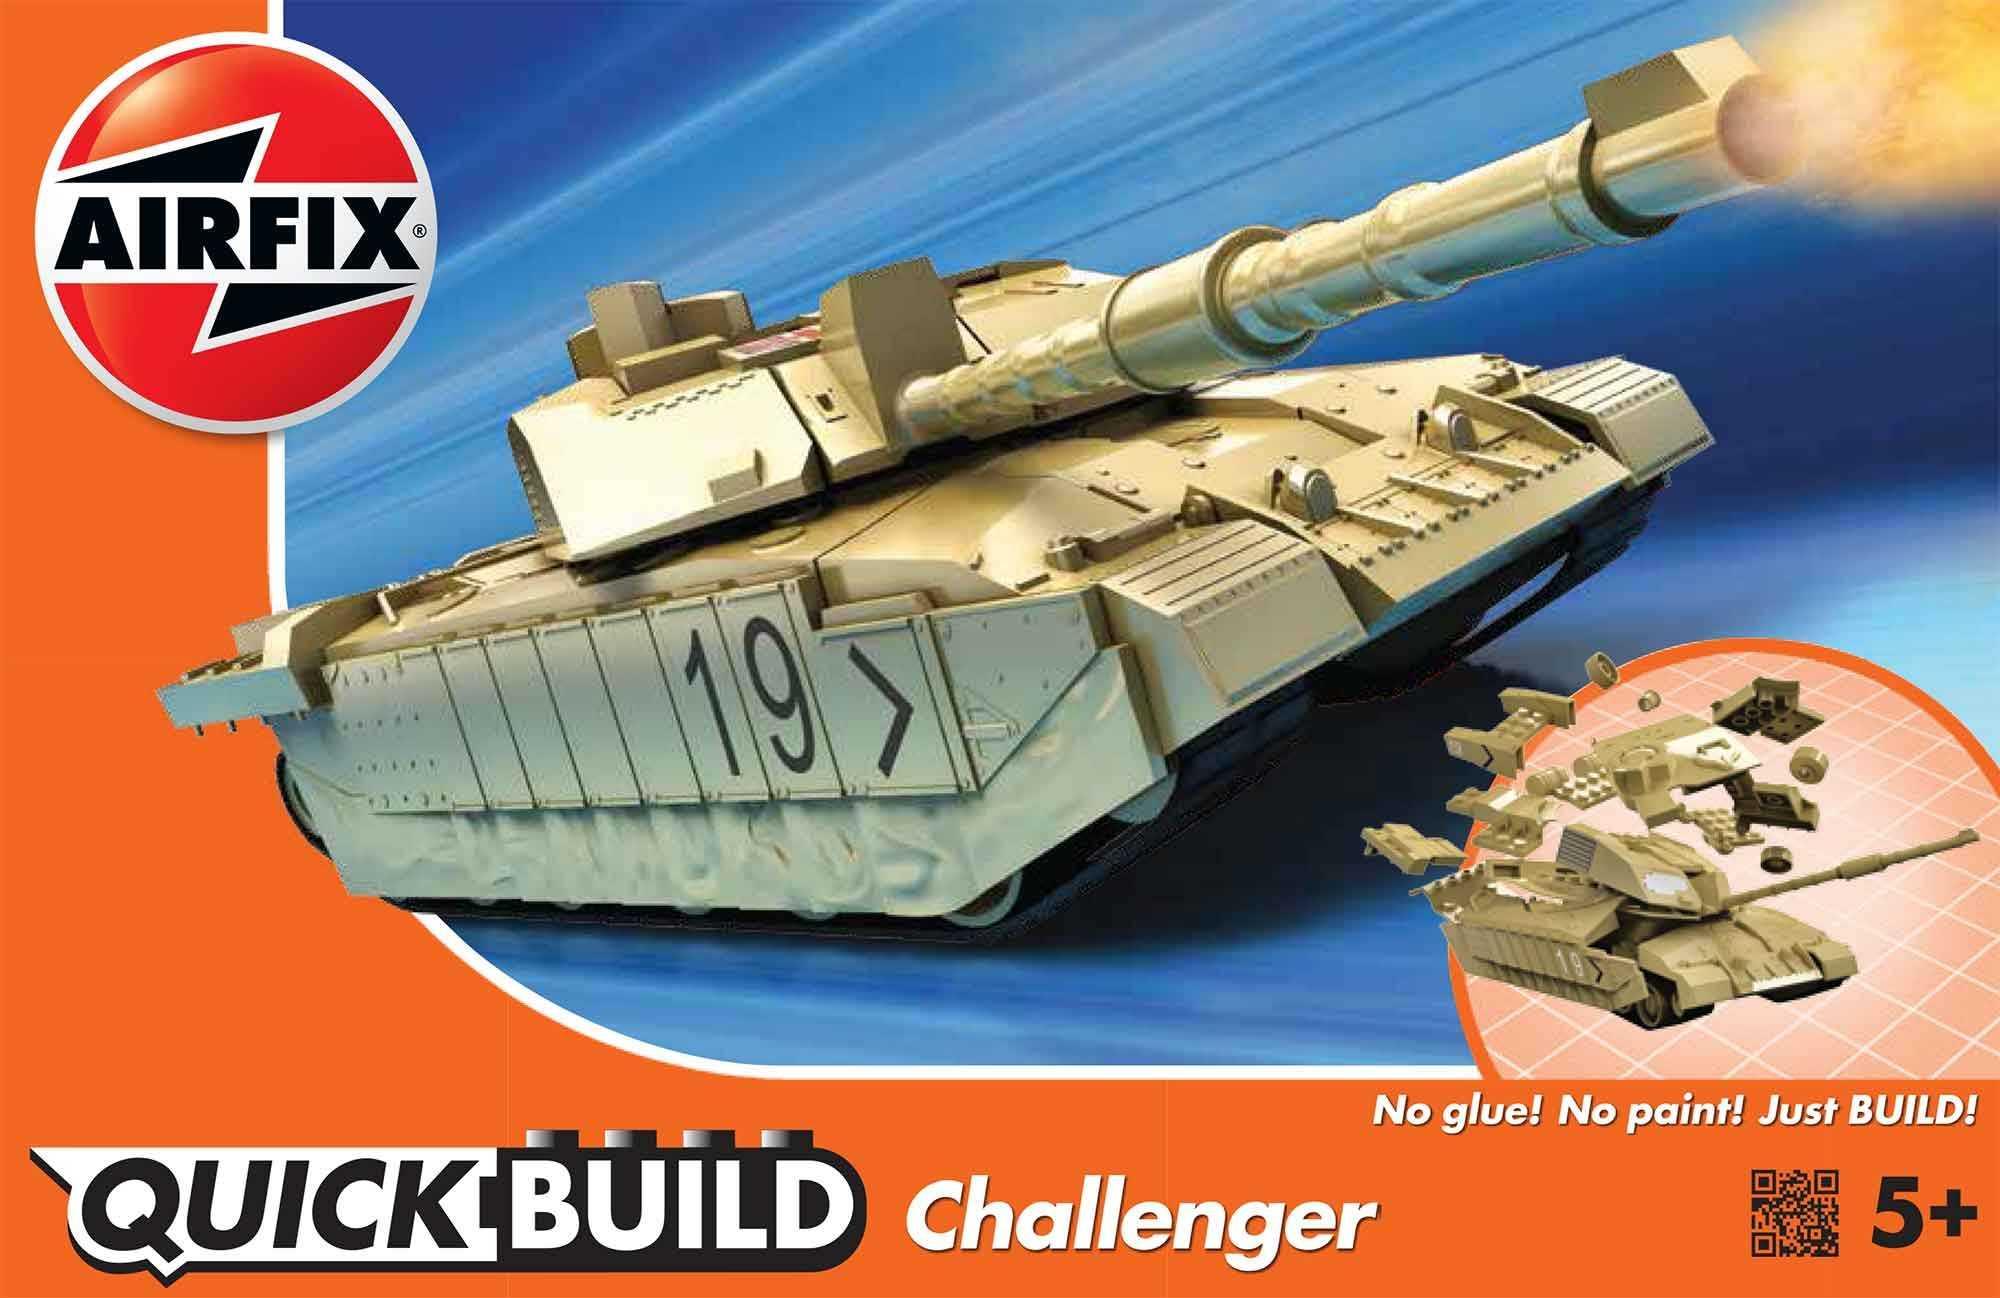 QUICK BUILD Challanger